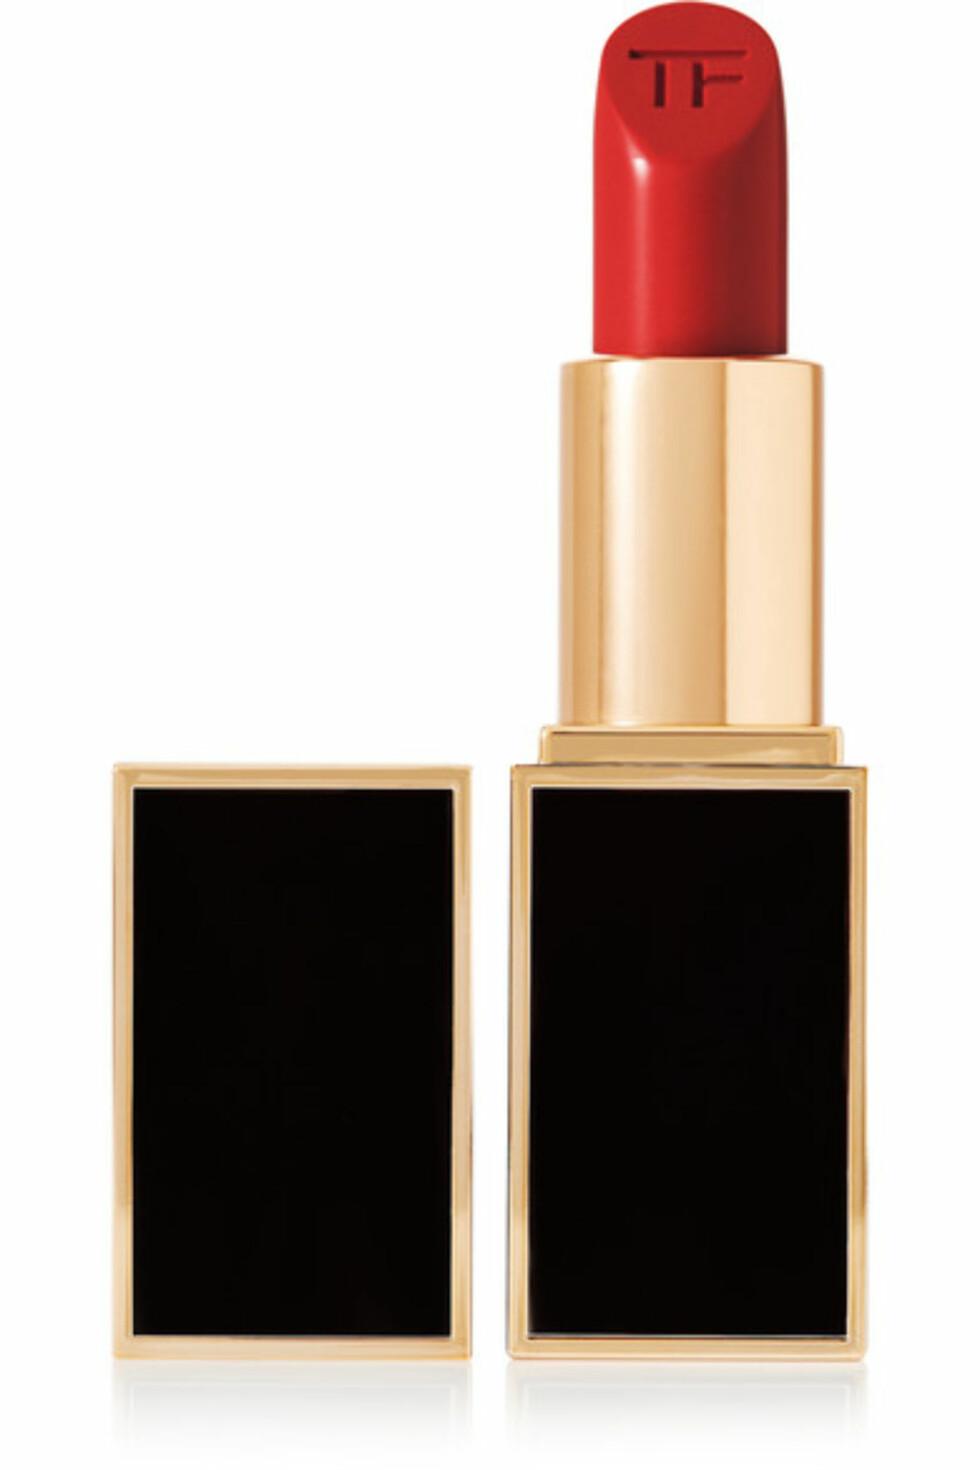 Leppestift fra Tom Ford via Net-a-porter.com | kr 424 | https://www.net-a-porter.com/no/en/product/760331/tom_ford_beauty/lip-color-matte---ruby-rush